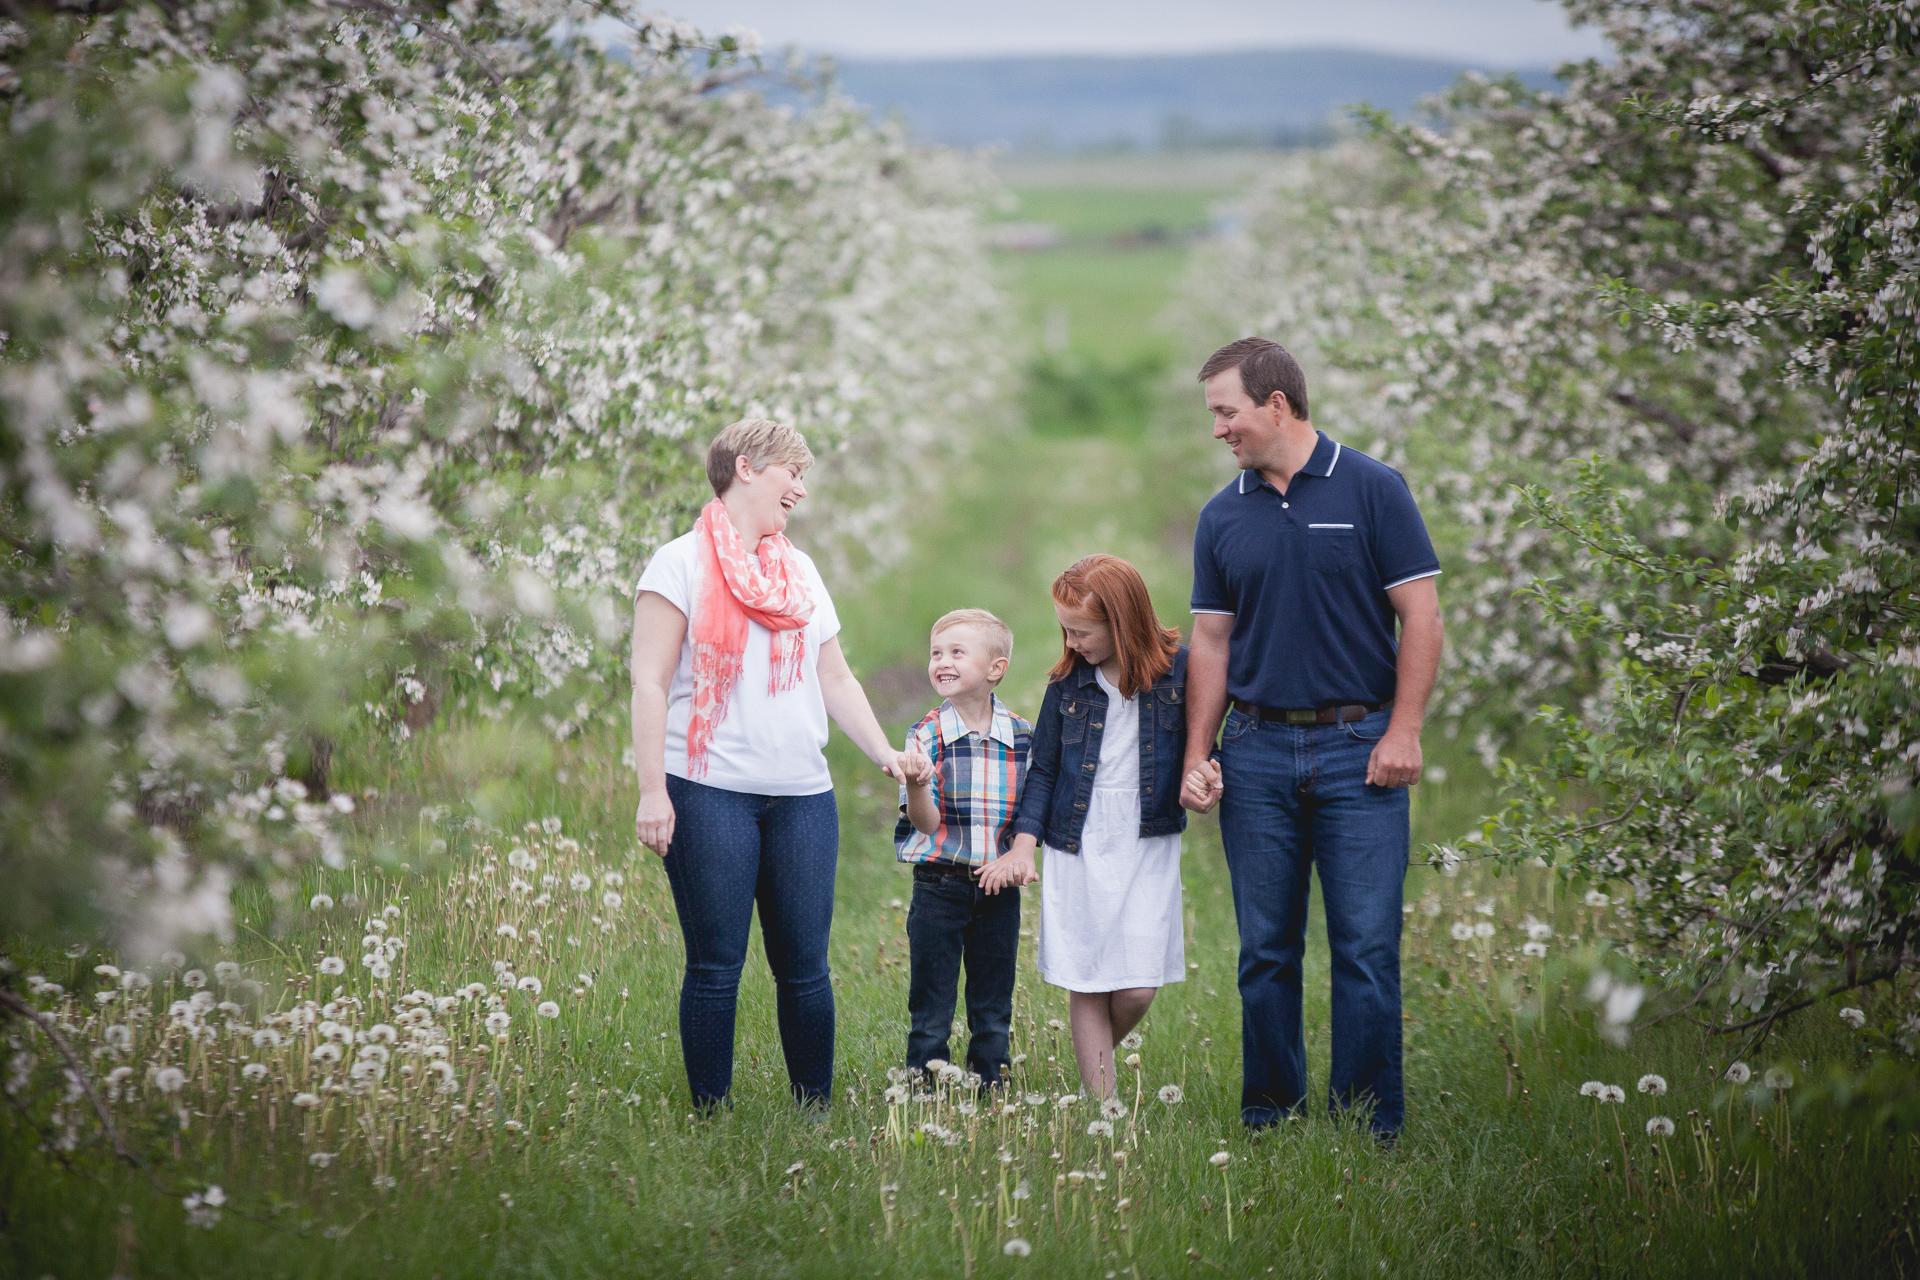 Family photograph from Blue Mountain, Ontario